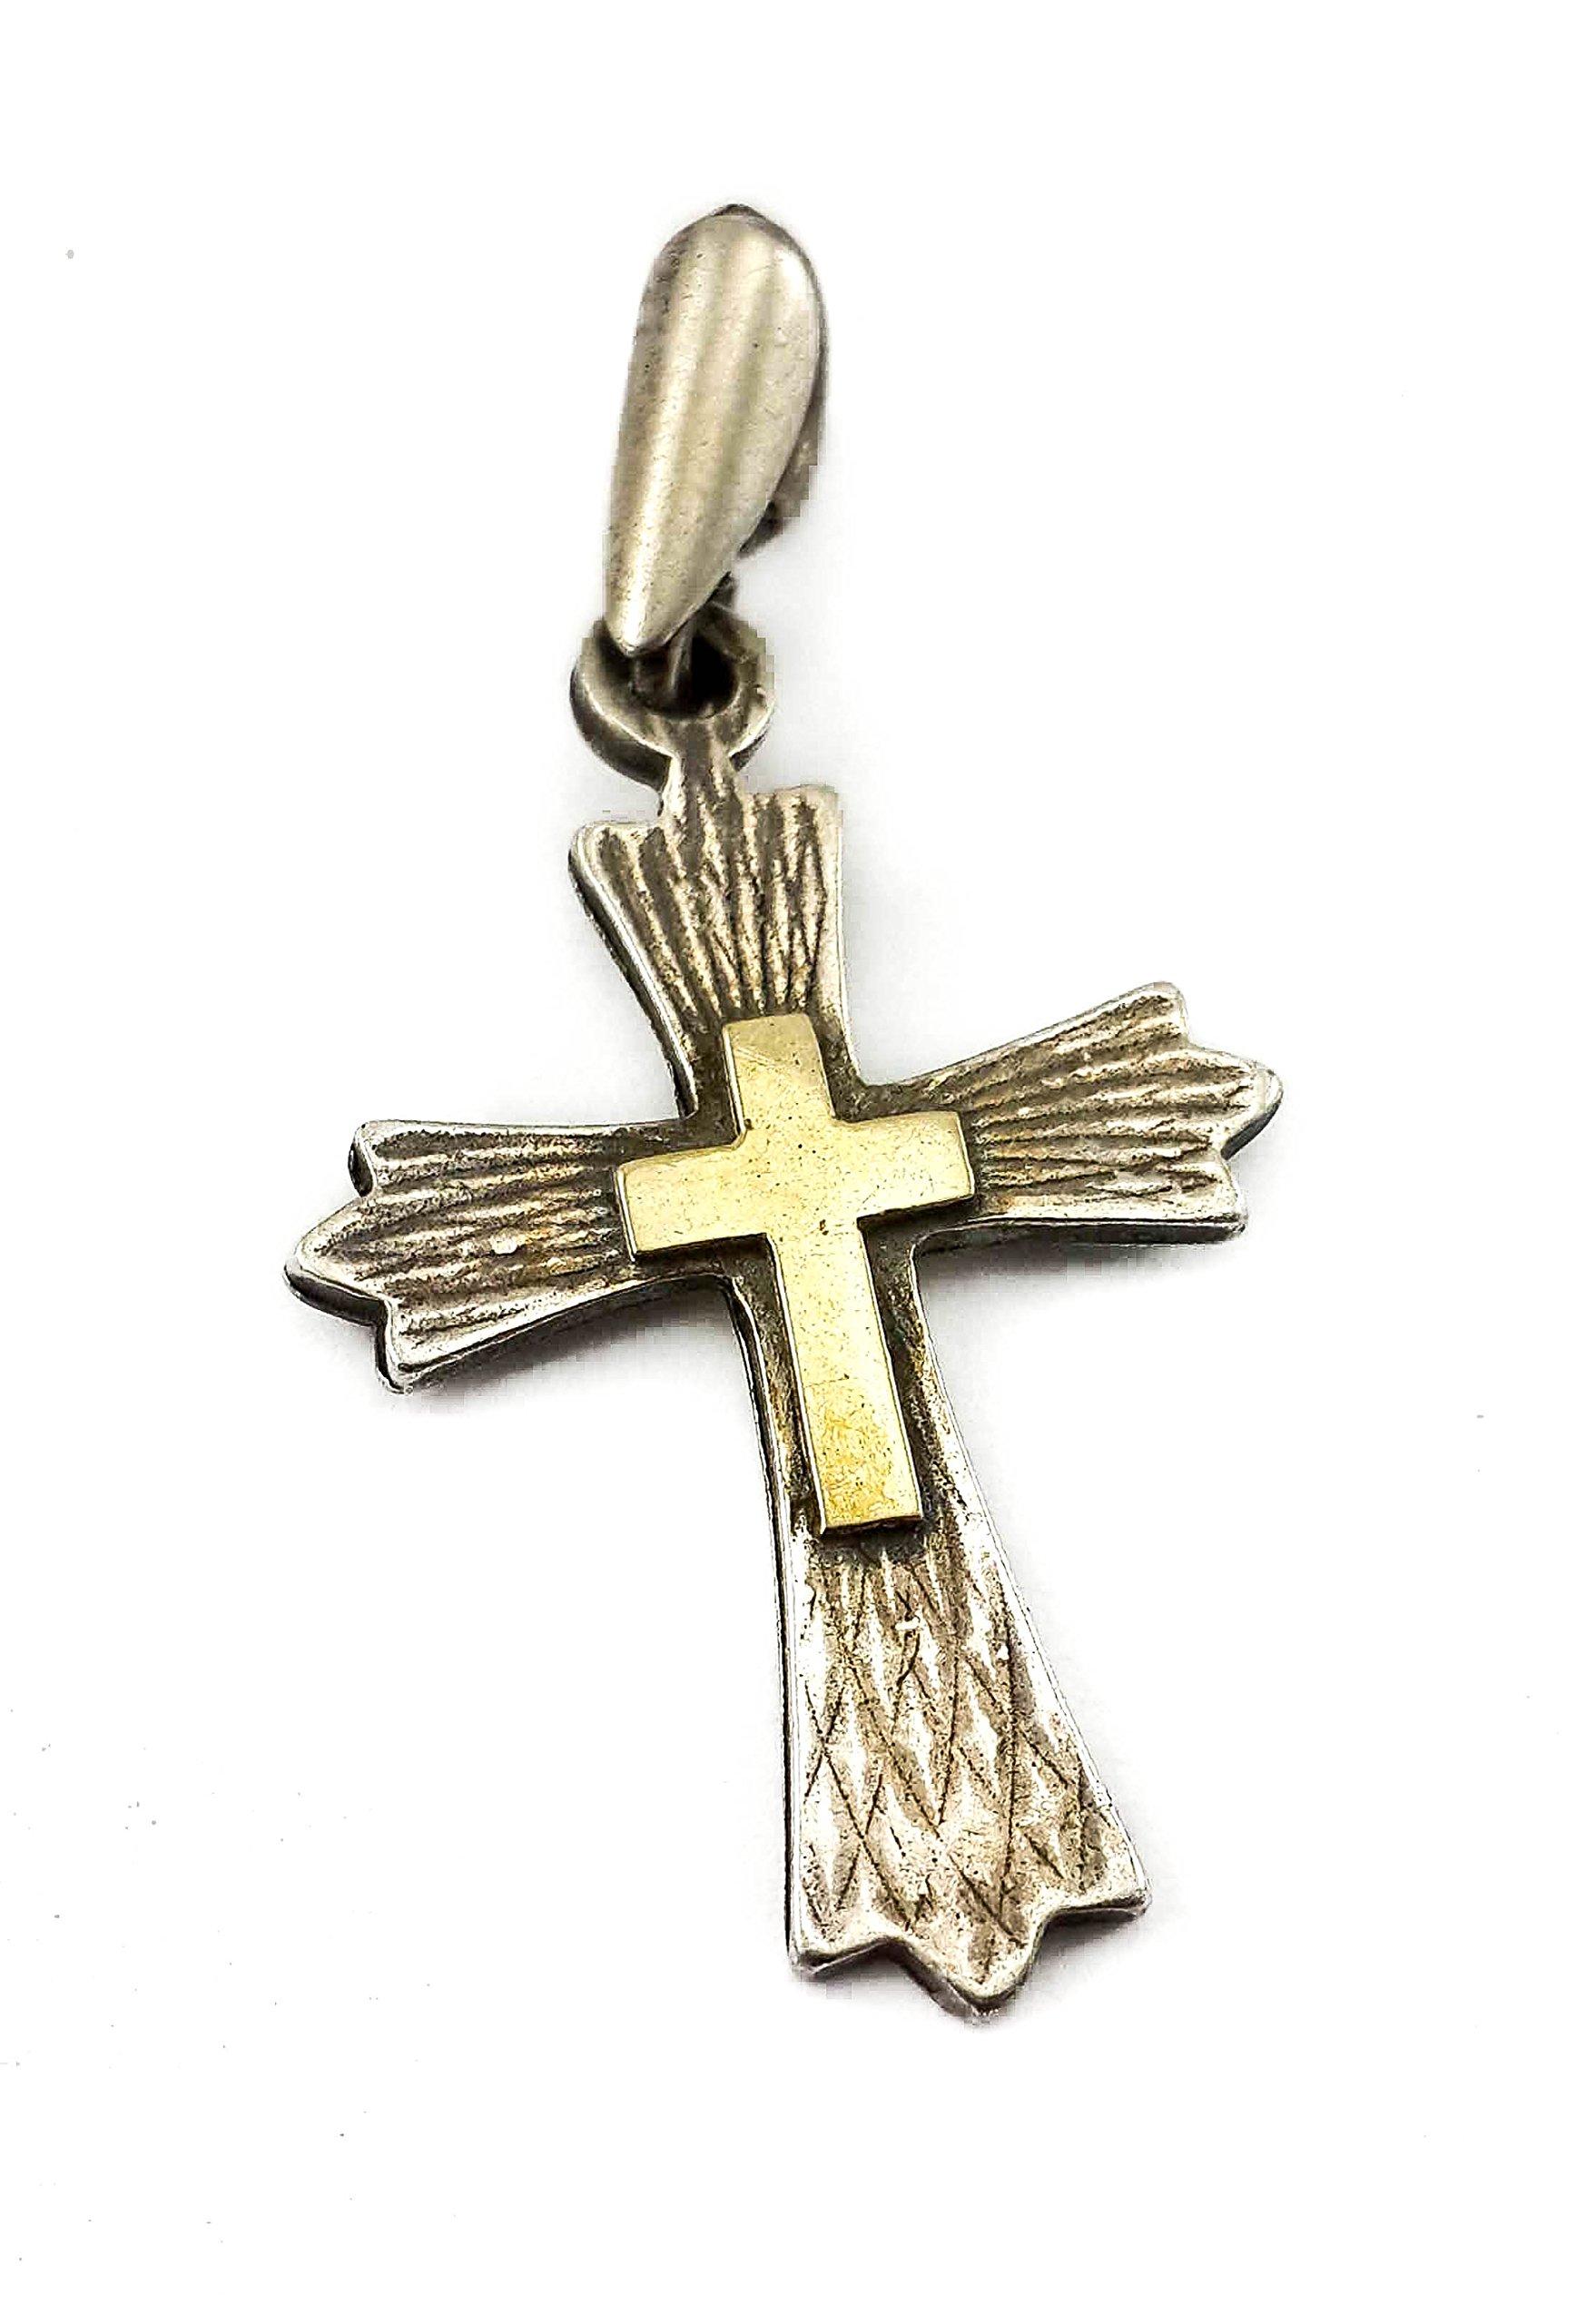 Christian Cross Silver 925 Pendant 9k Gold Vintage Design Jerusalem Crucifix 1.1'' by NZRT